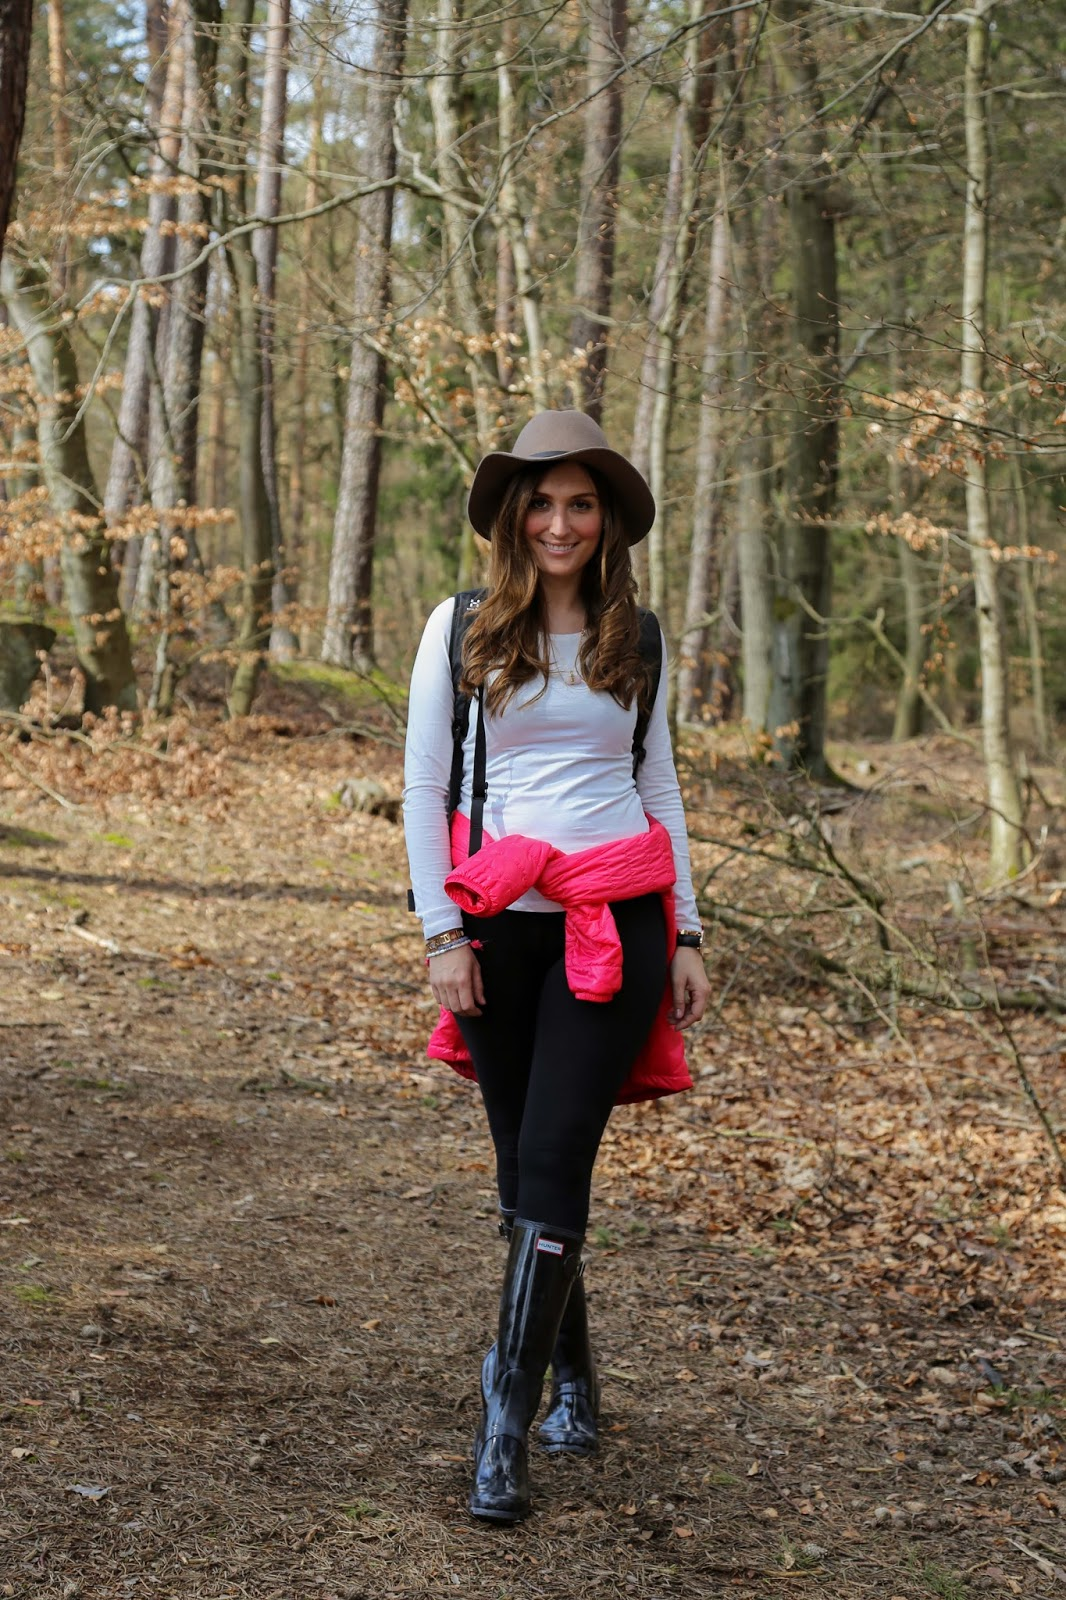 Decathlon Jacke - Pinke Steppjacke - Steppjacke in Pink - pinke Jacke Fashionblogger - Fashionstylebyjohanna